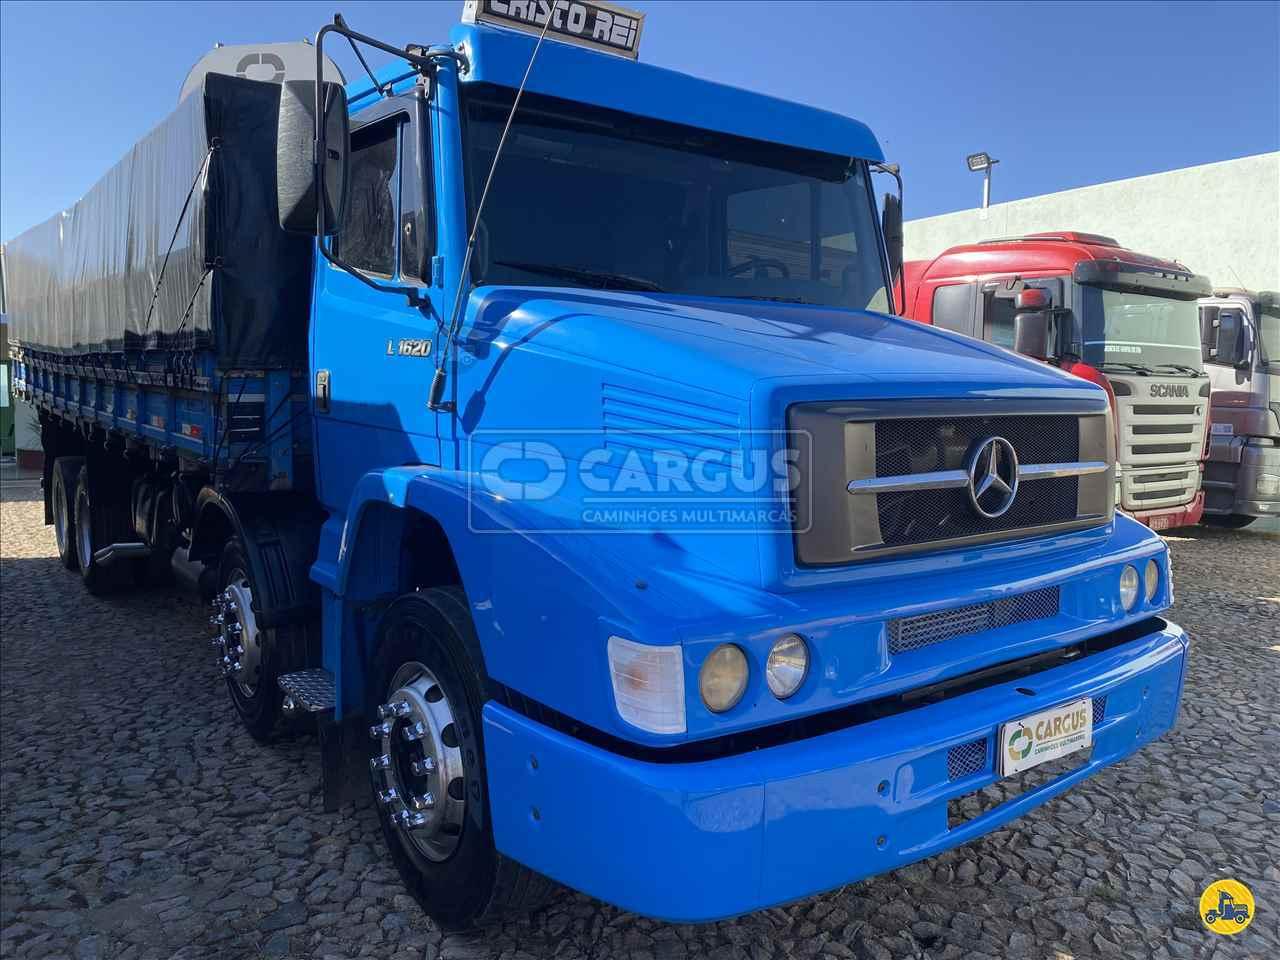 MB 1620 de Cargus Veículos - PARA DE MINAS/MG